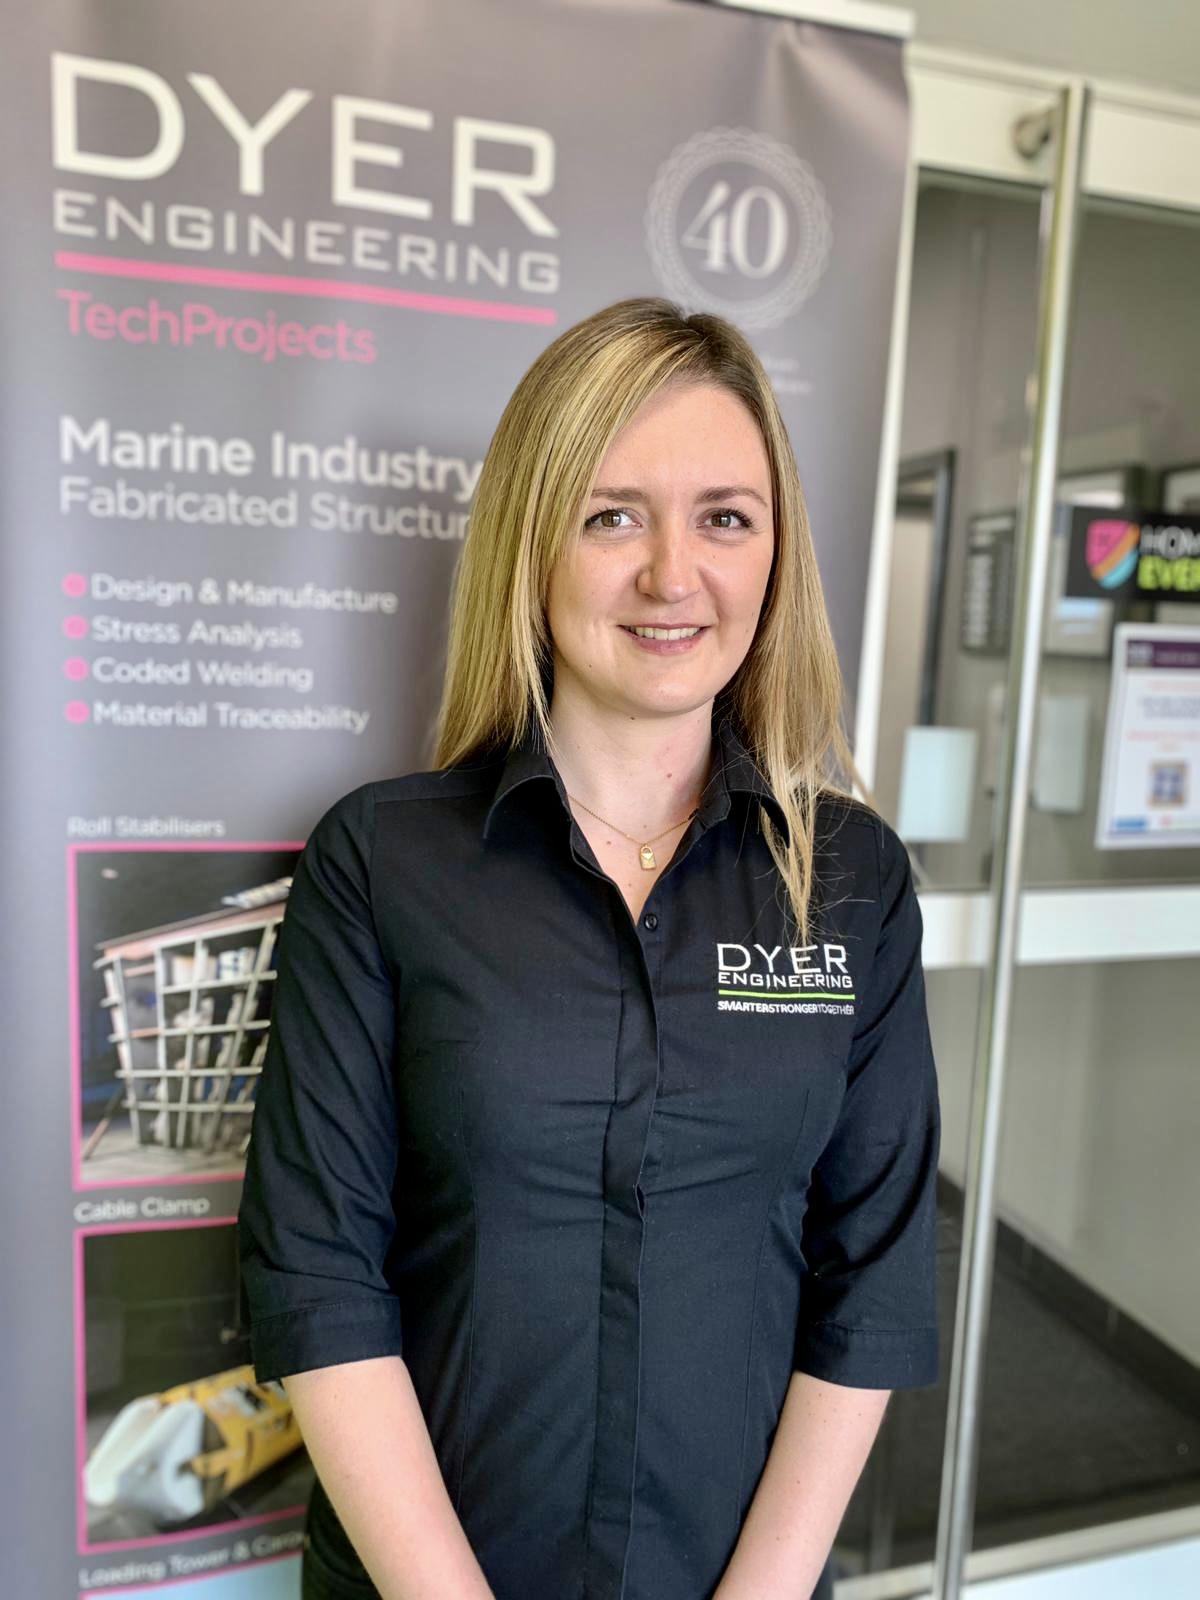 Anastasia Reay Joins Dyer Engineering